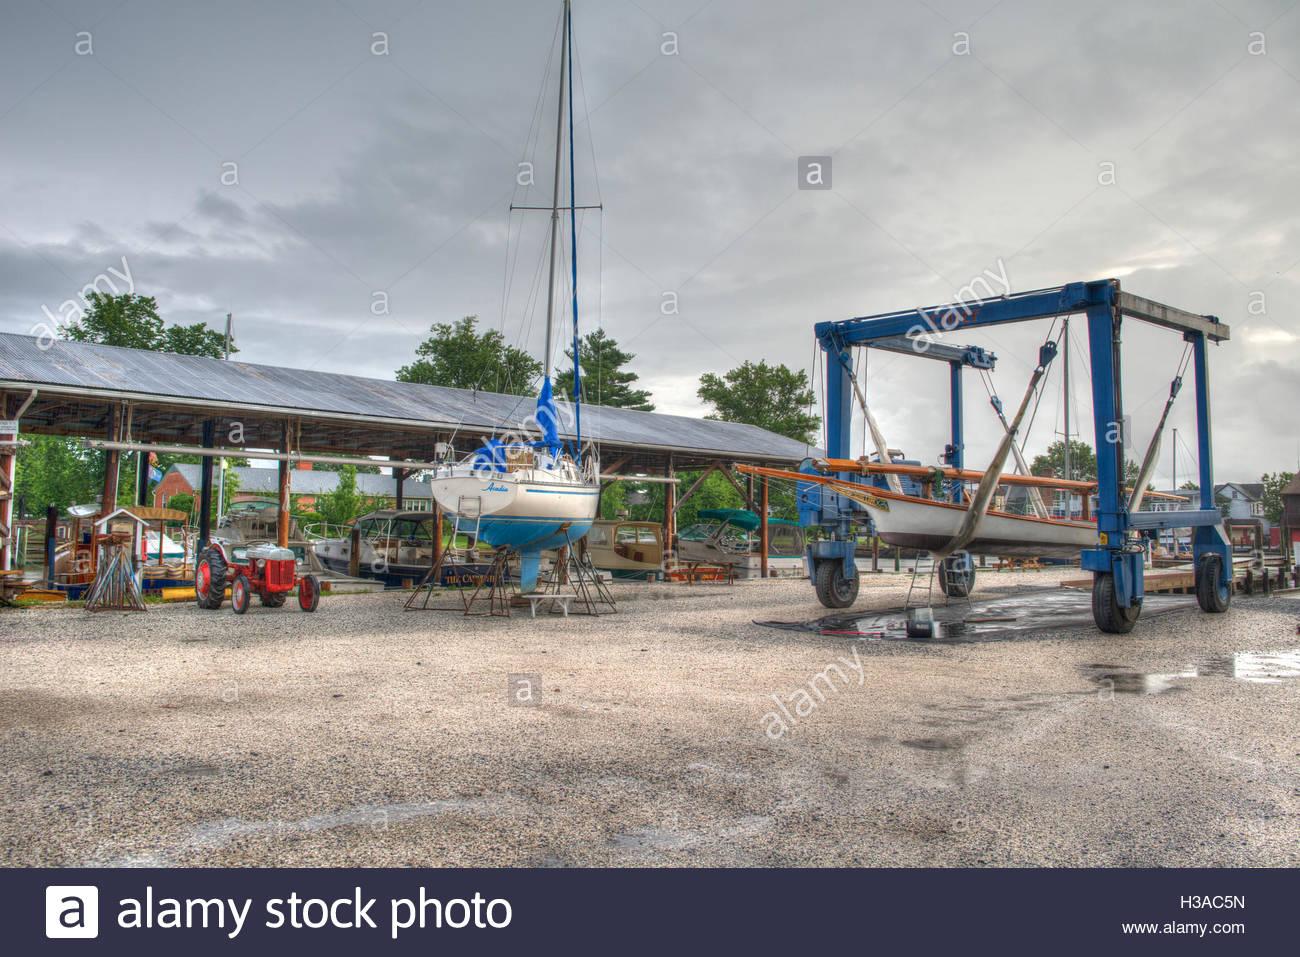 A sailboat, log canoe, and boat lift in a shipyard. - Stock Image